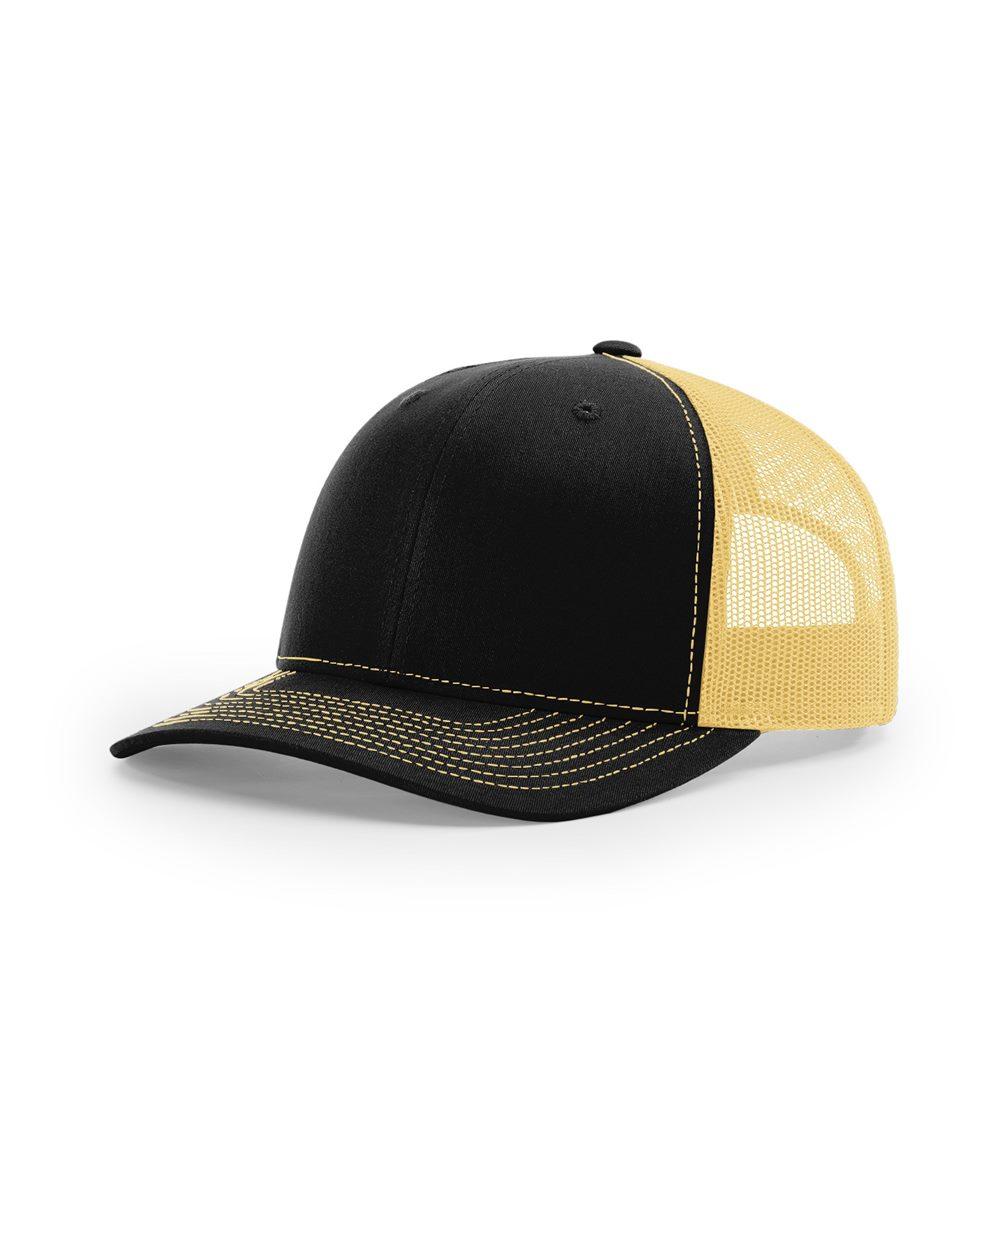 click to view Black/ Vegas Gold